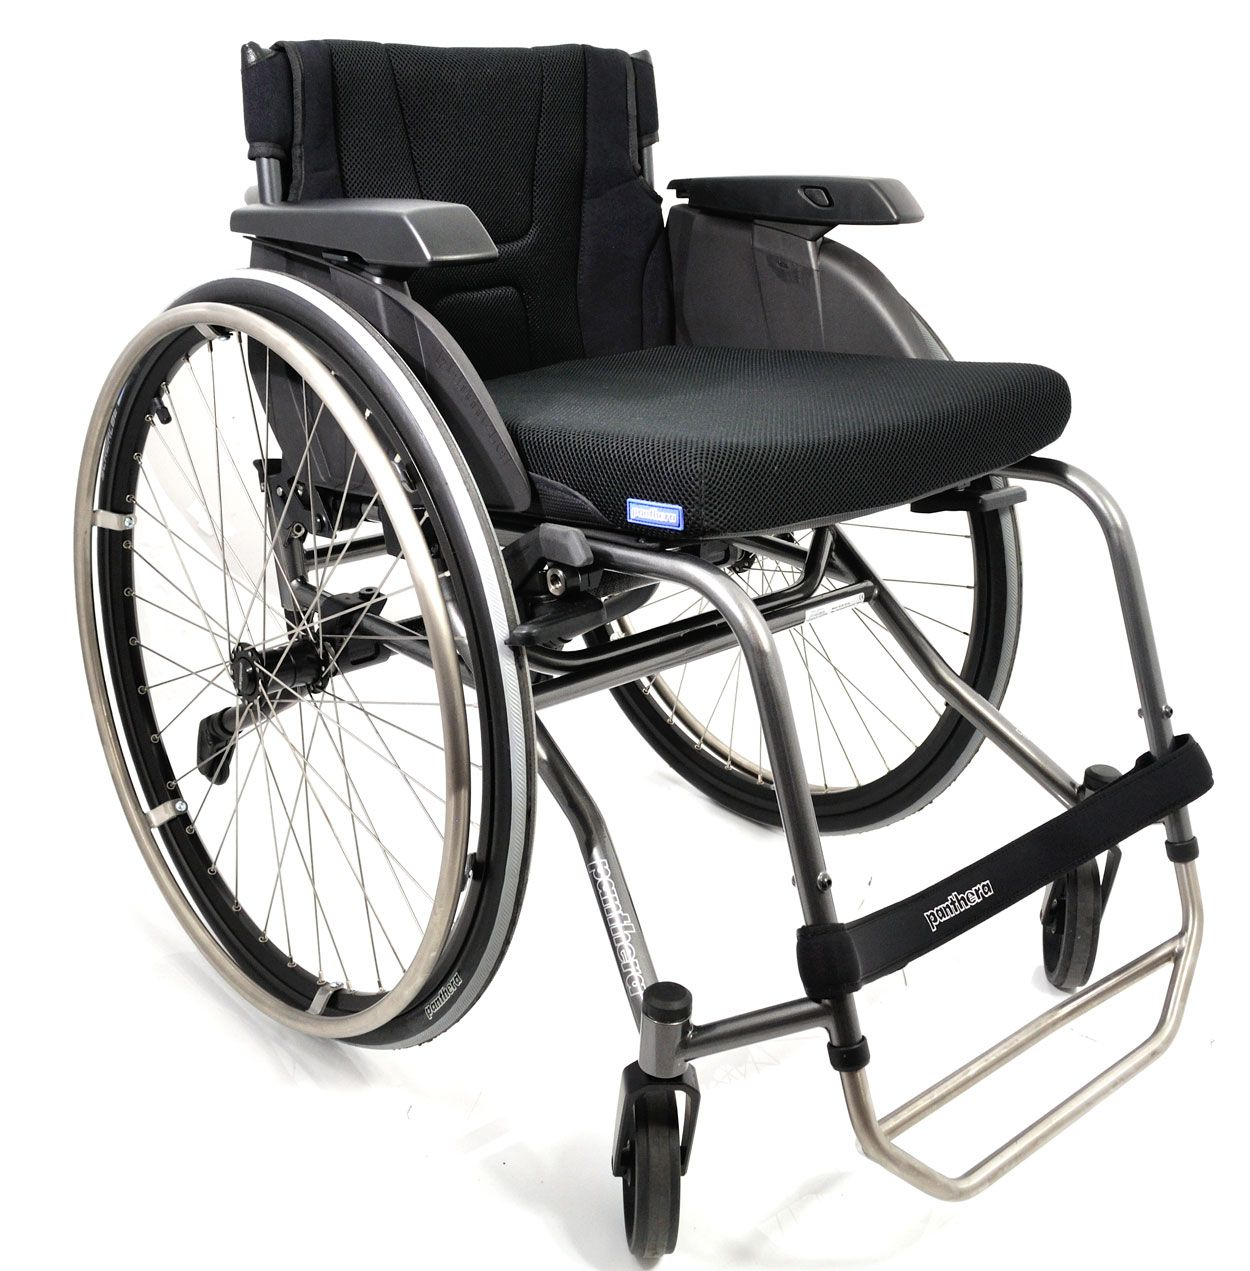 Wheelchair Killer Swivel Chair Pink Panthera S3 Rolstoel Dagelijks Gebruik Daily Use